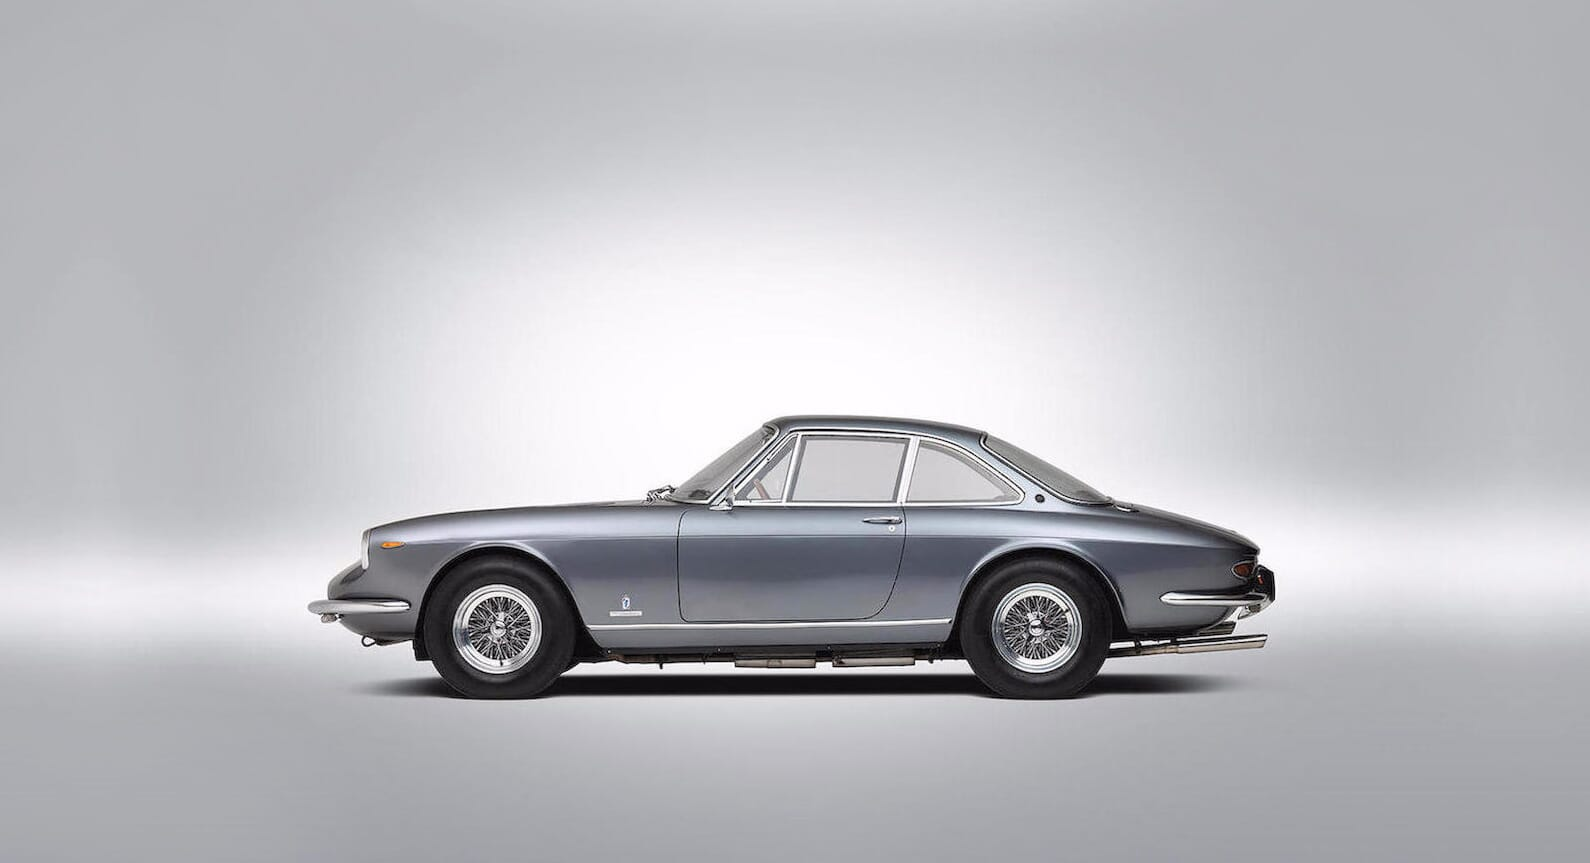 Classic Car Find of the Week: 1968 Ferrari 365 GTC Coupe